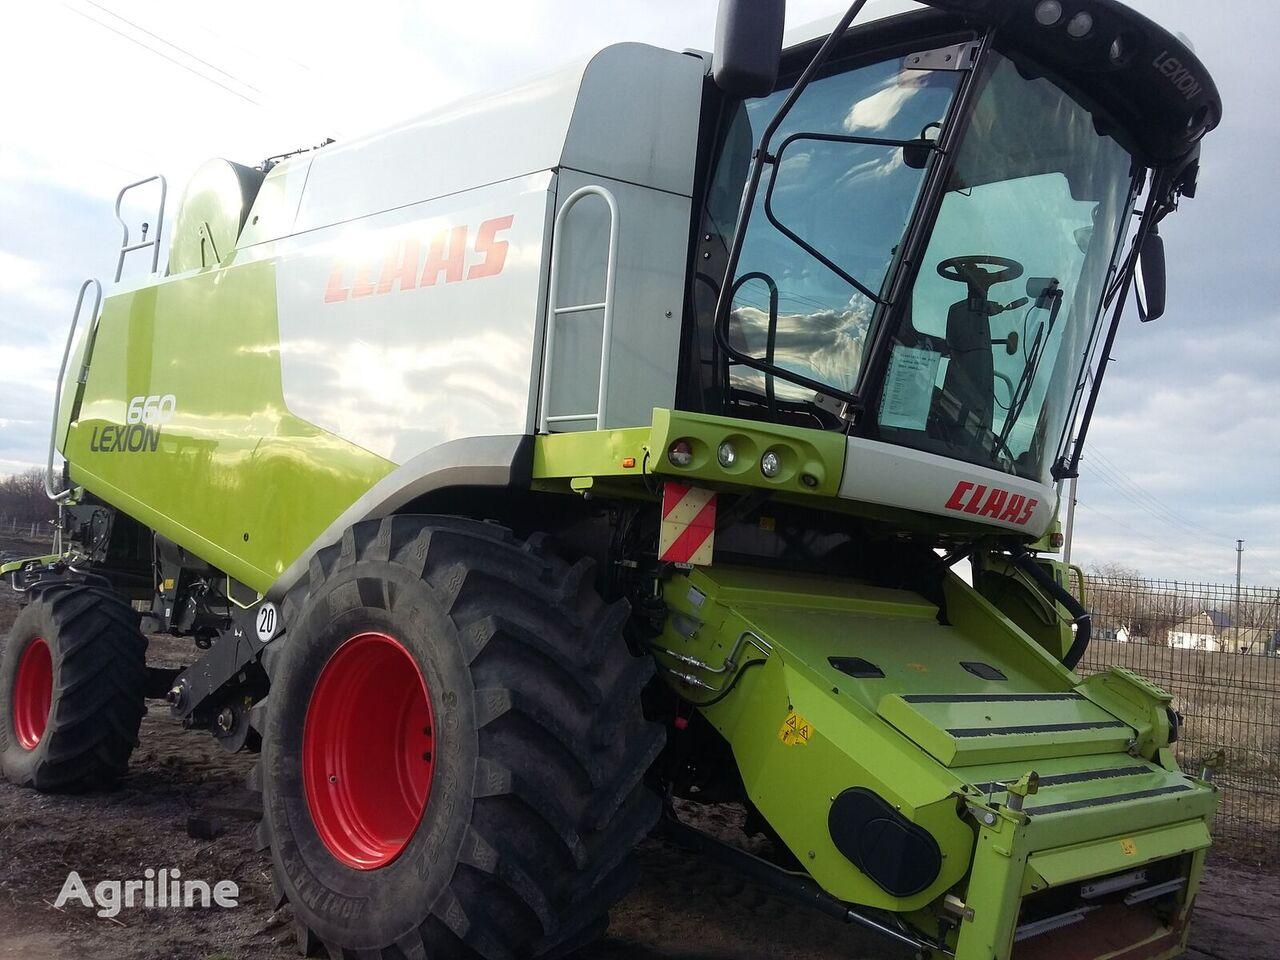 CLAAS Lexion 660 grain harvester